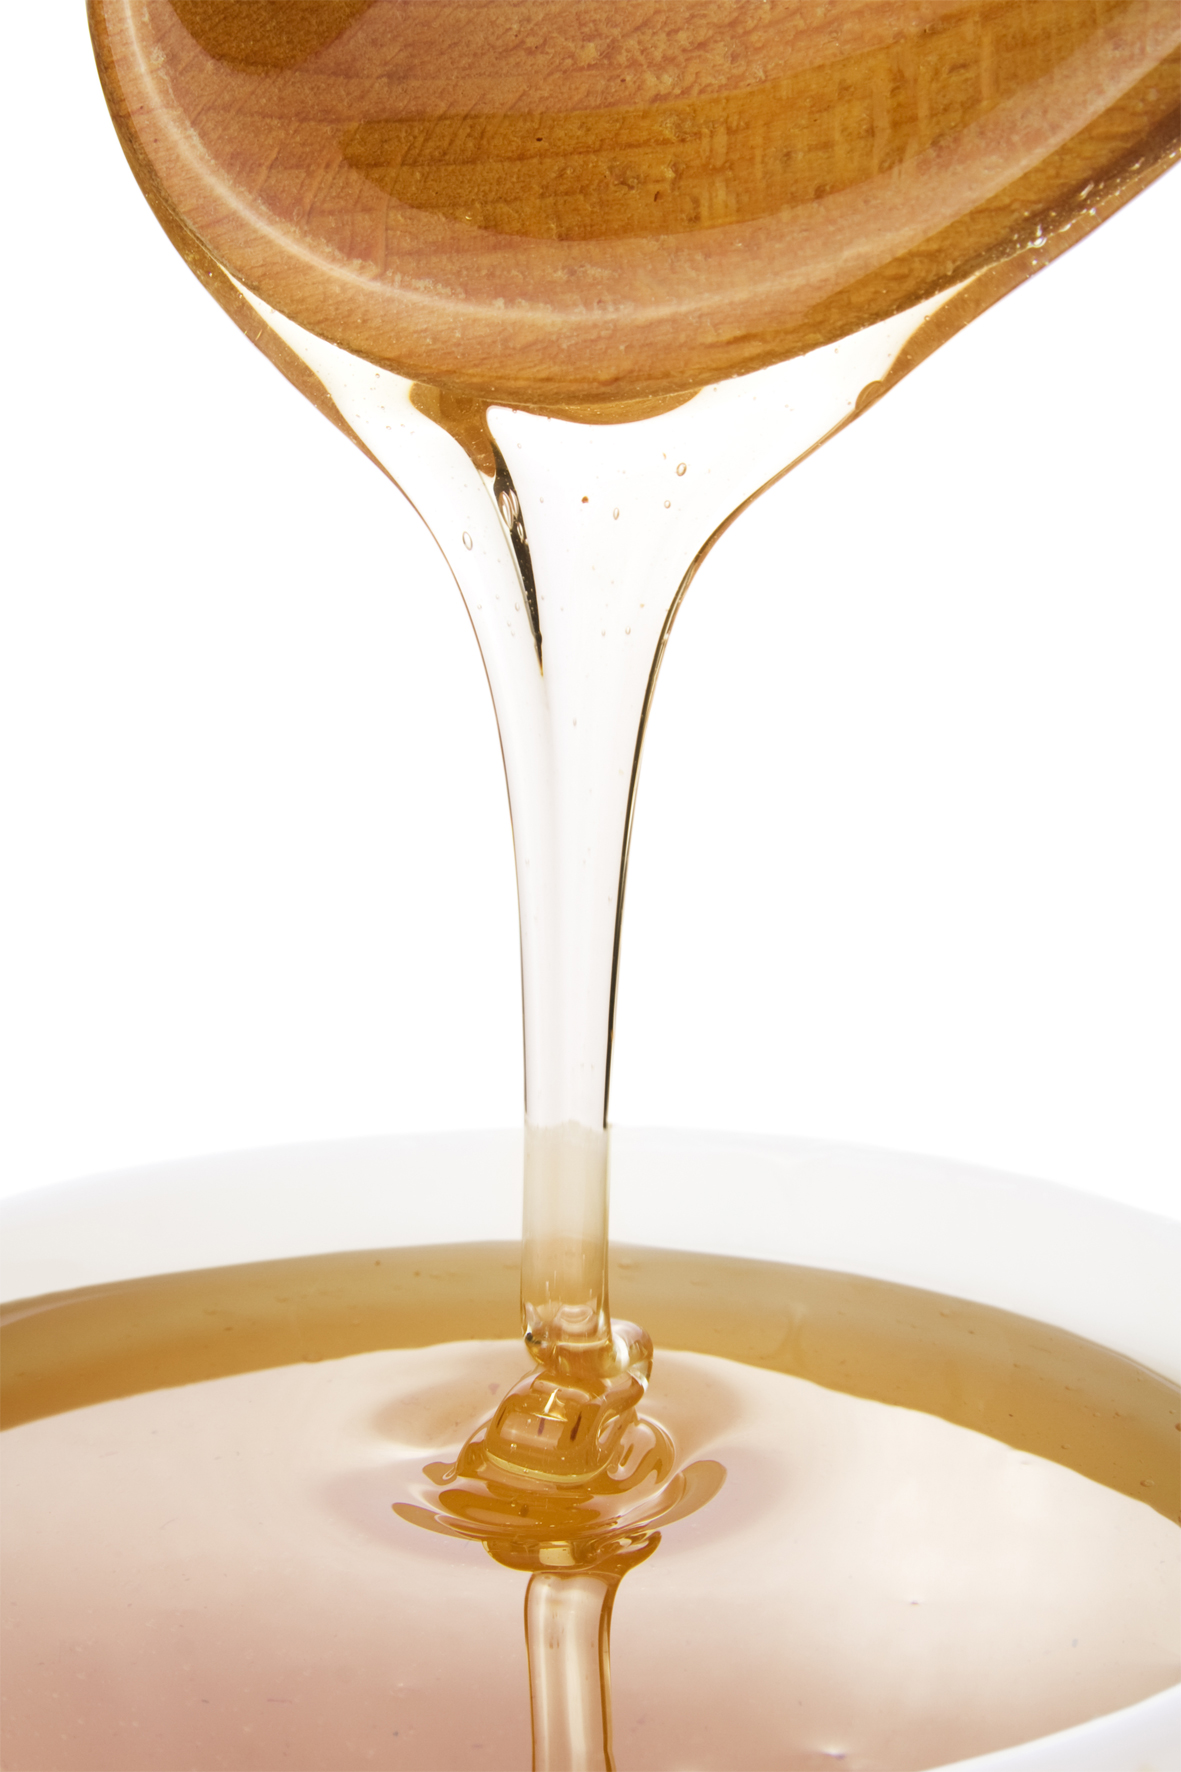 Corn-syrup-1